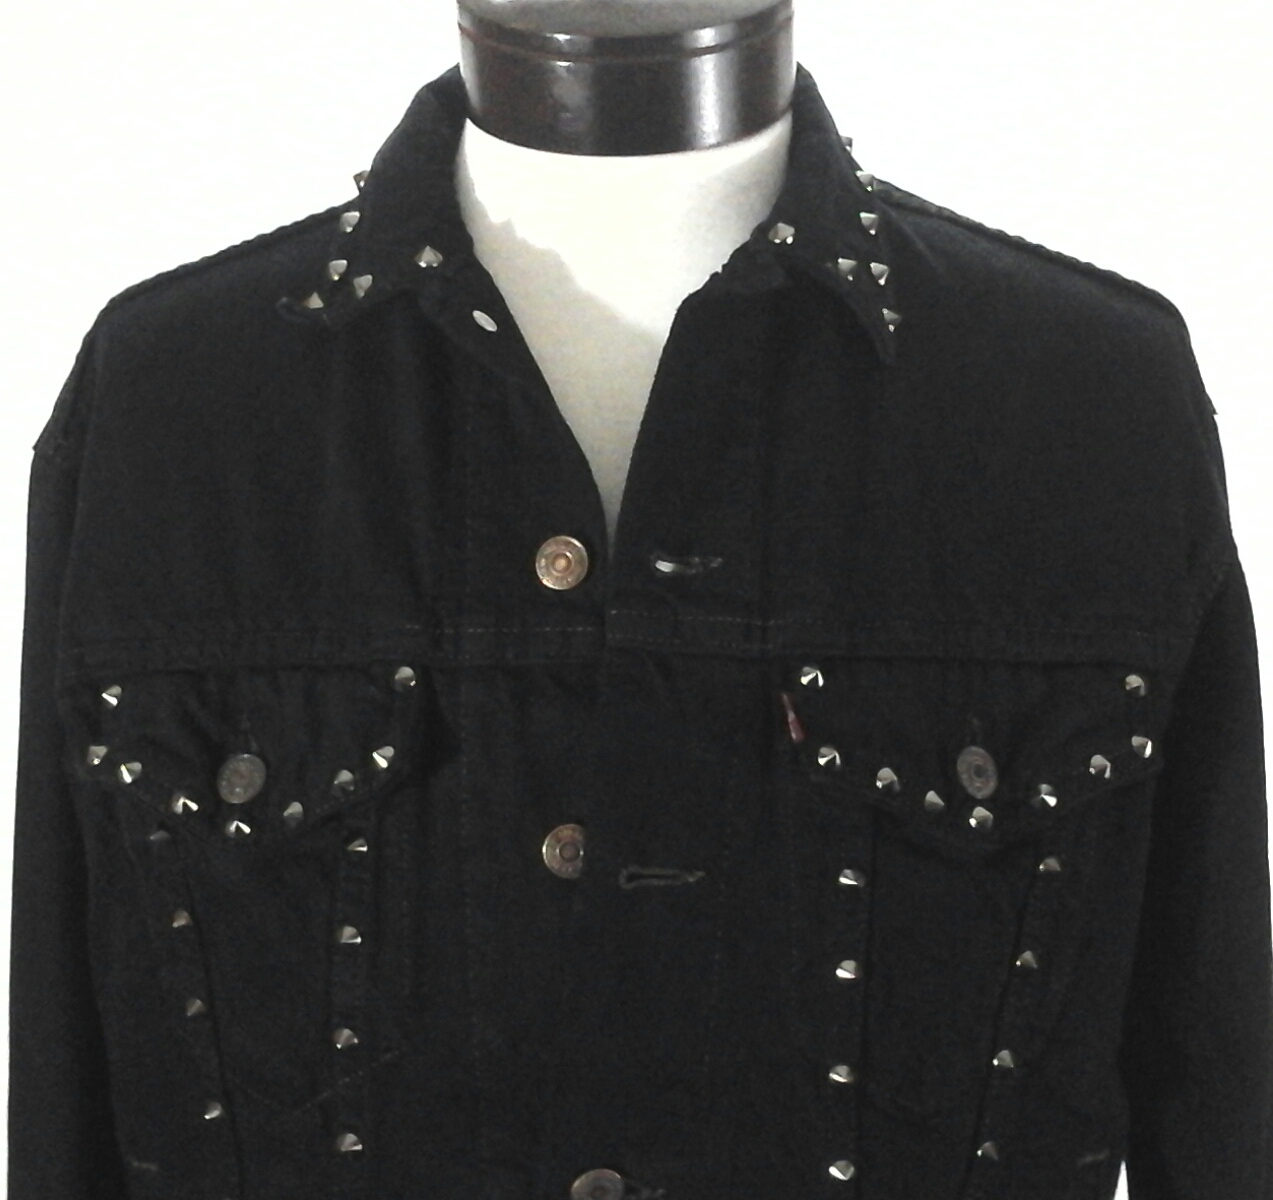 da0e70f951 Details about LEVI S Denim Jacket Trucker Studs Punk Life Is A Game Hard  Eight Black L fits M